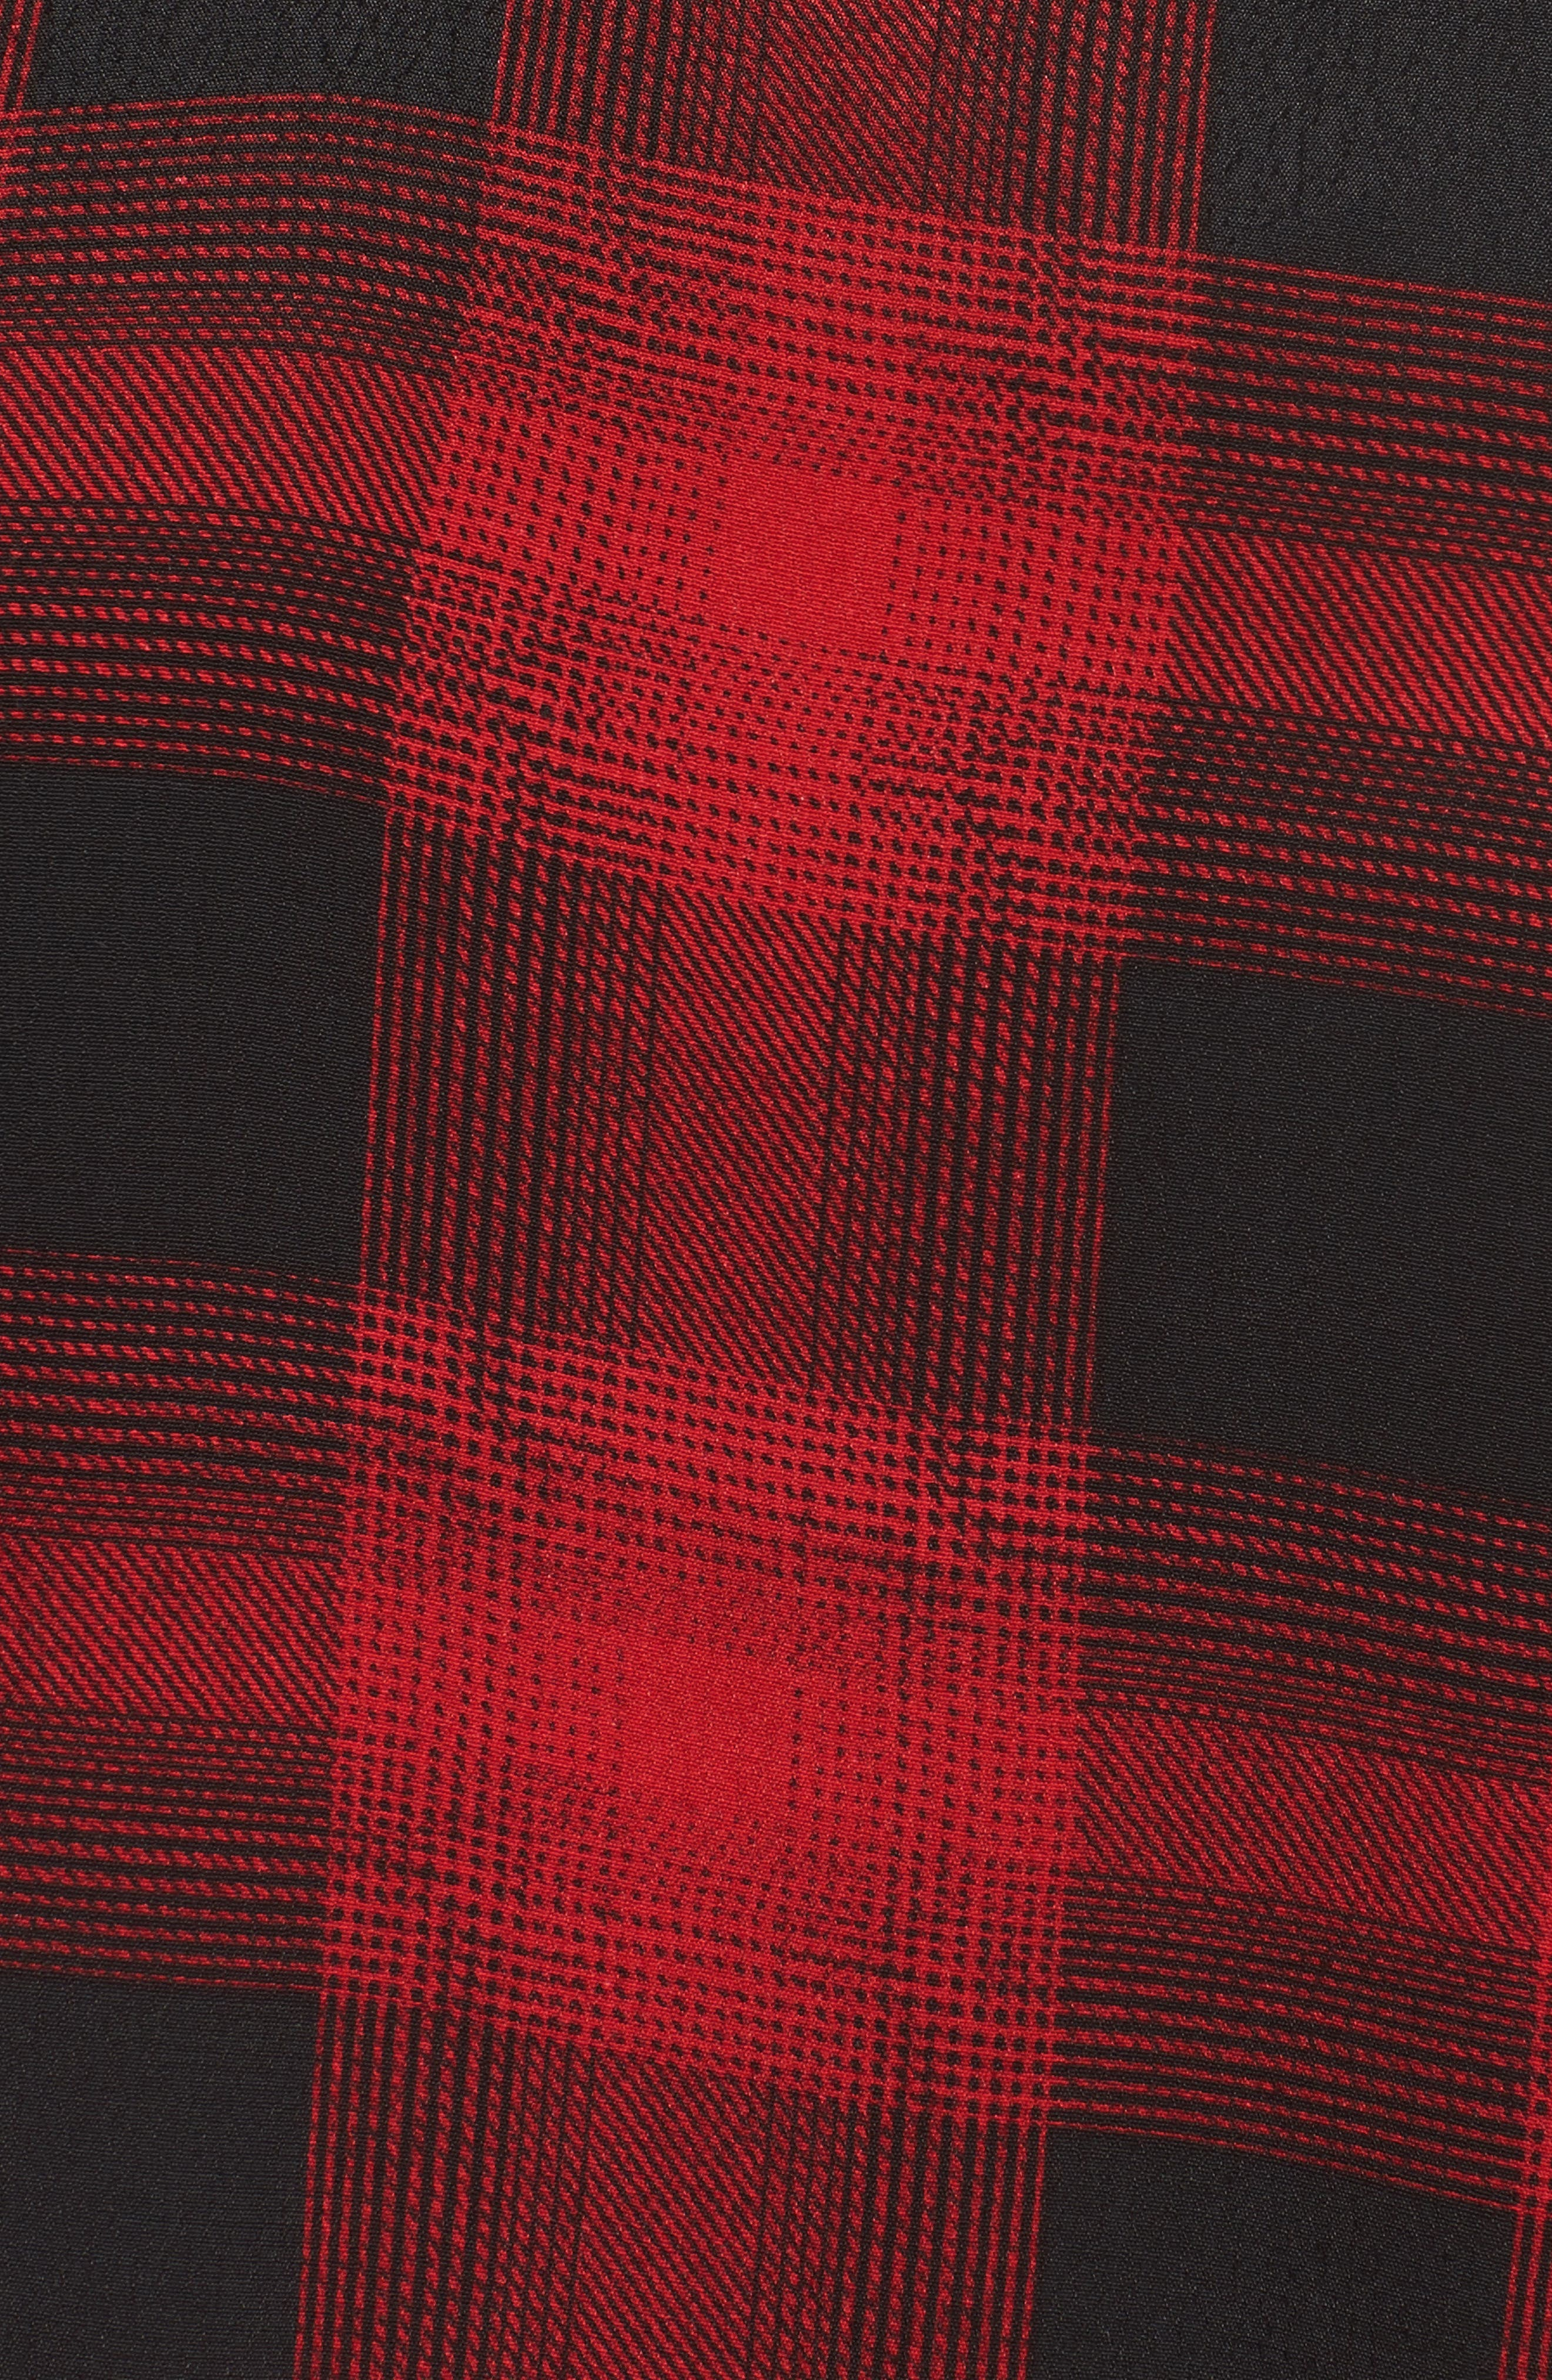 V-Neck Peplum Top,                             Alternate thumbnail 5, color,                             Black- Red Grady Plaid